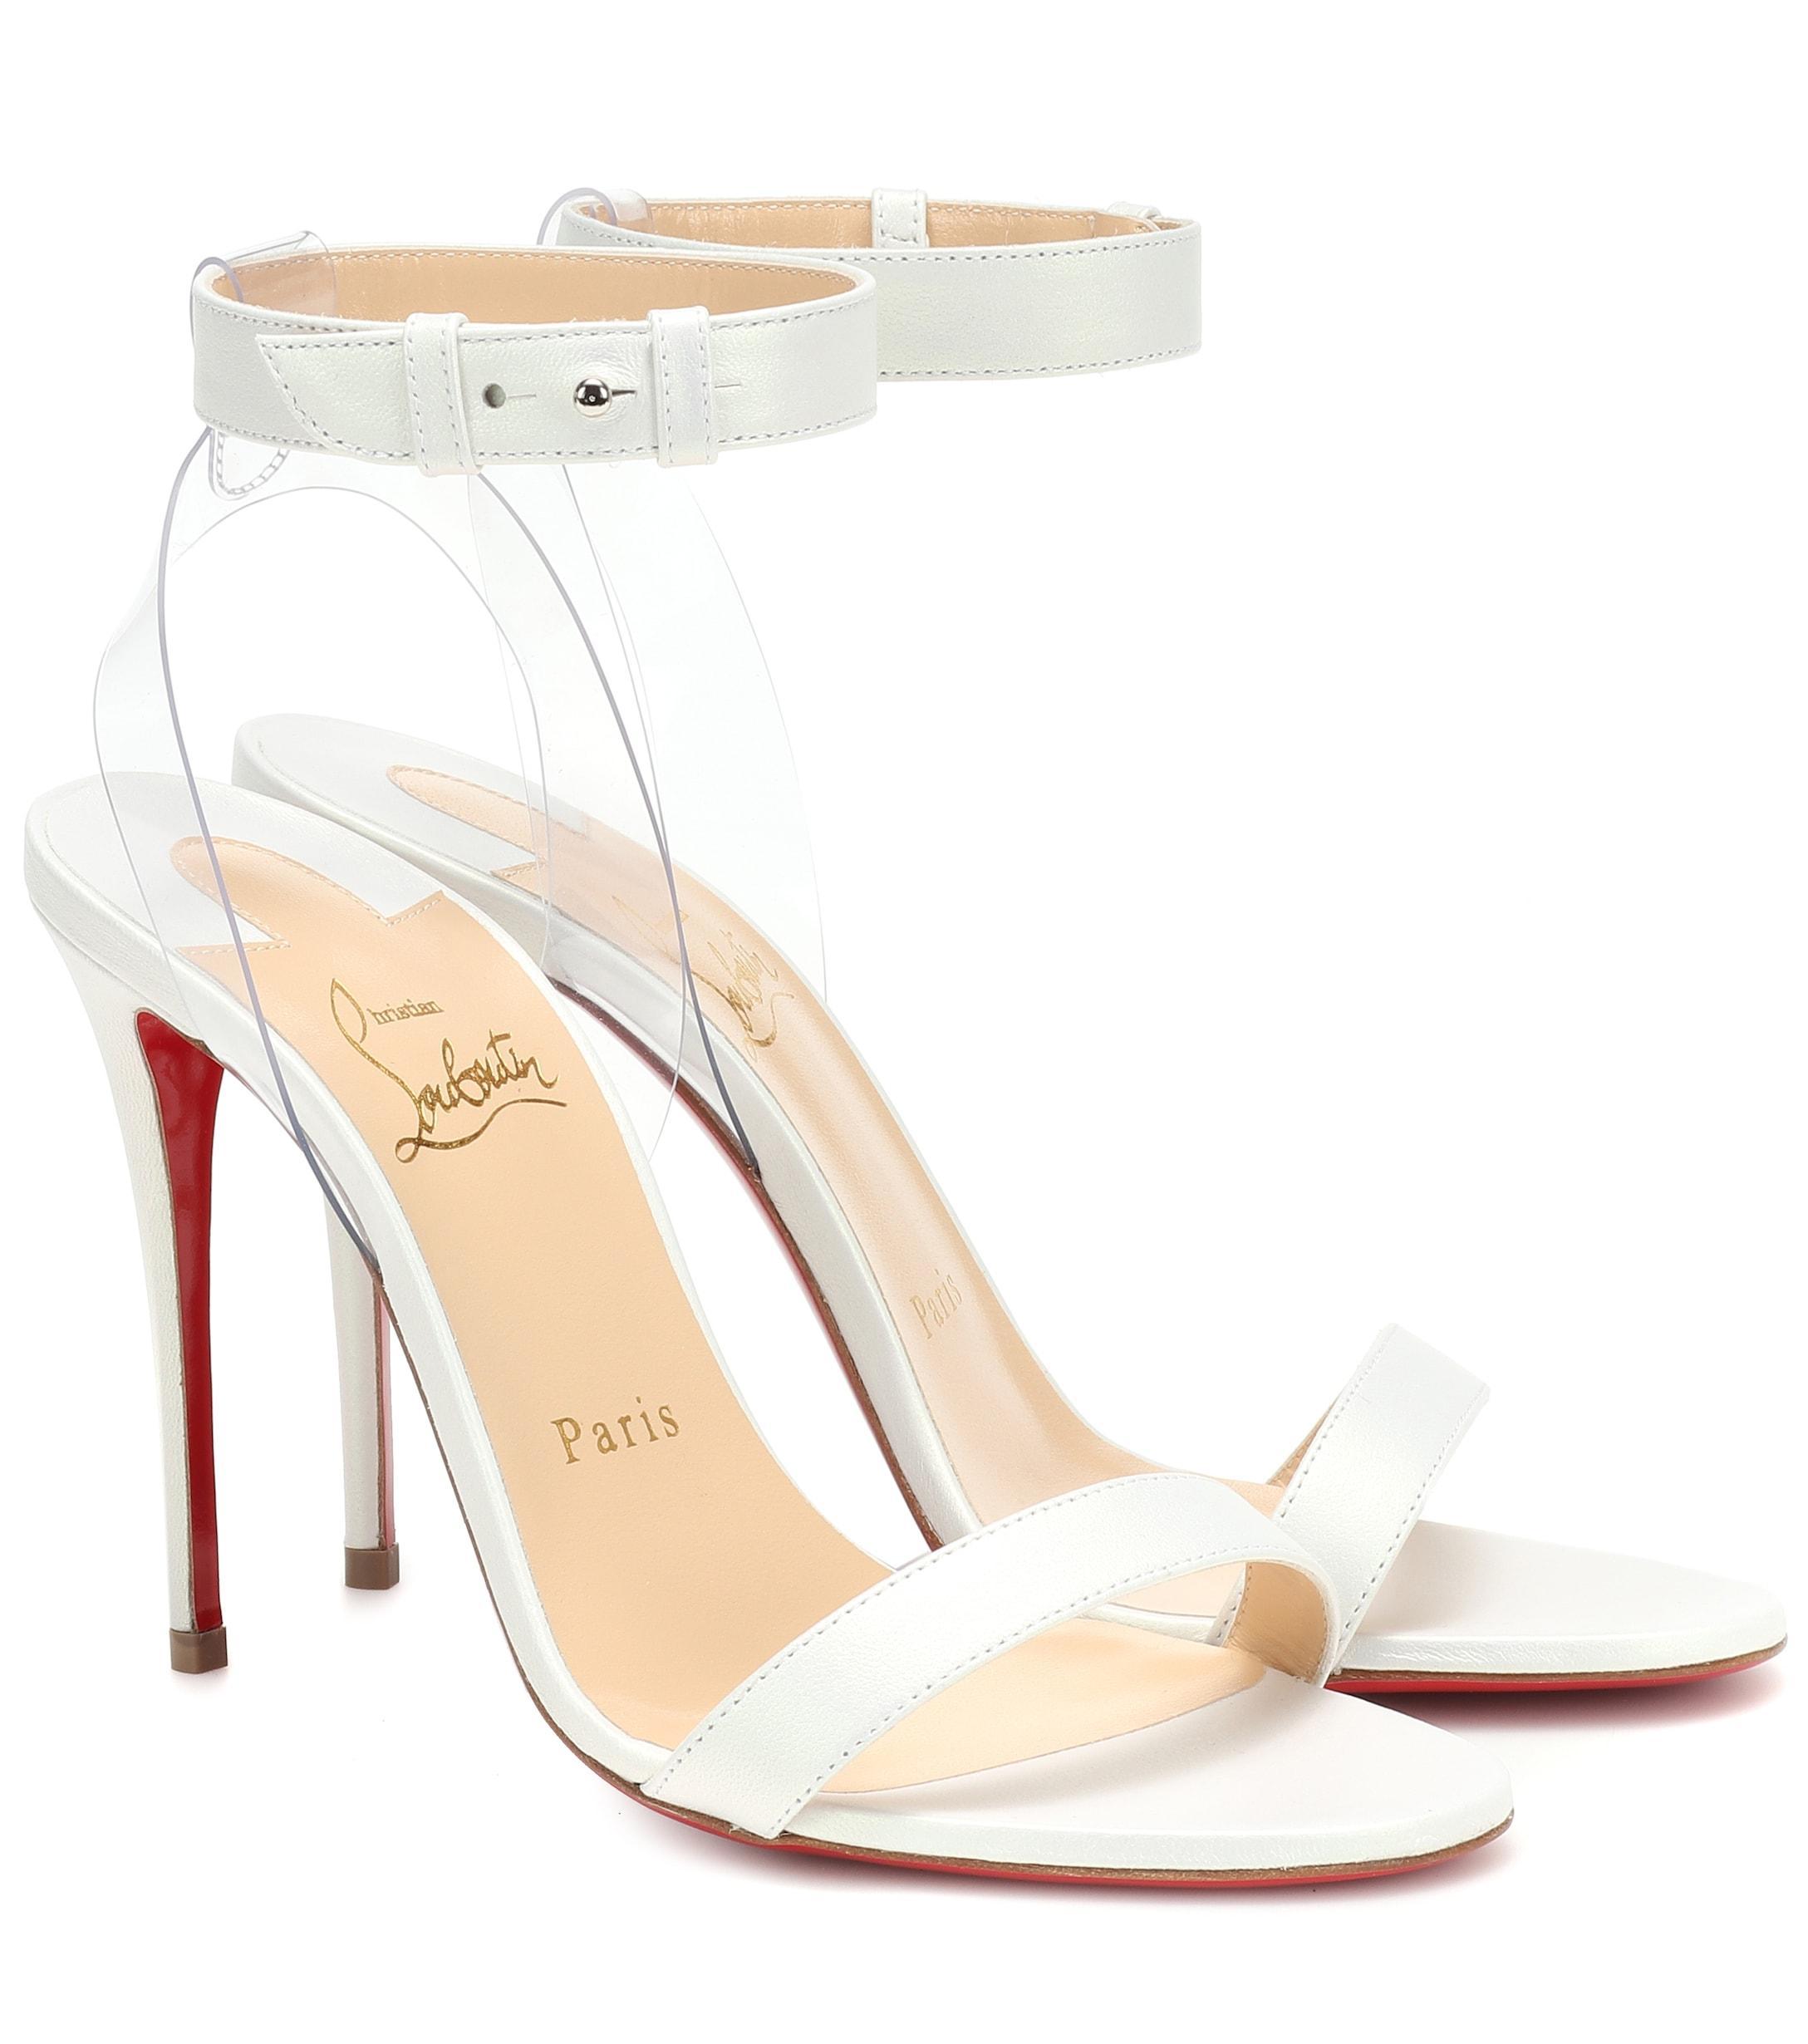 d7d16019682c Christian Louboutin. Women s Jonatina 100 Leather Sandals